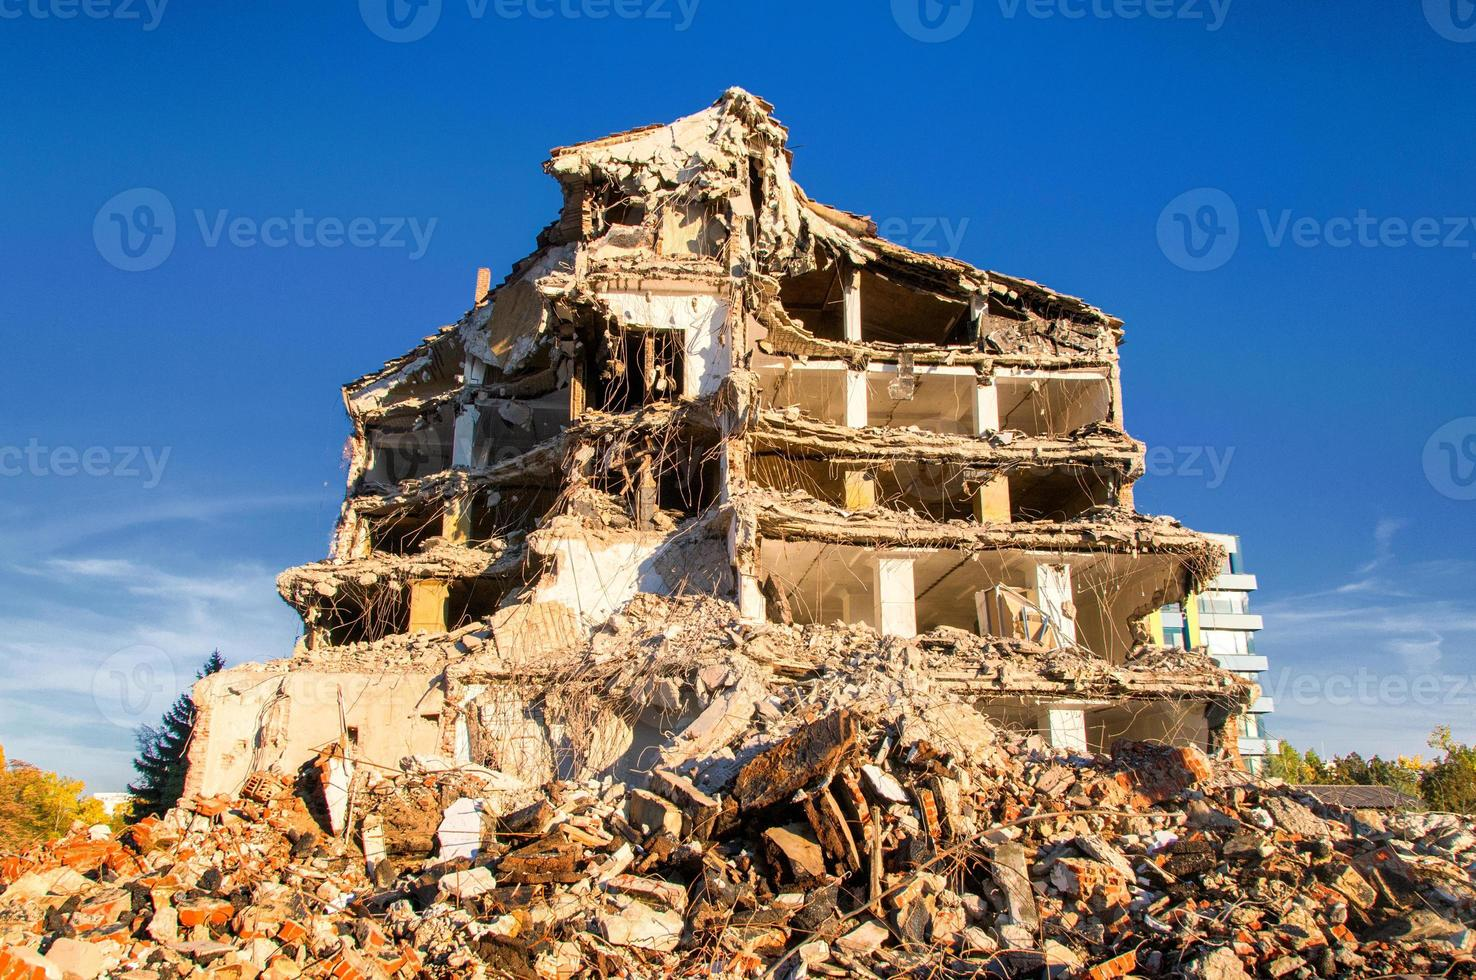 Demolition of buildings in urban photo